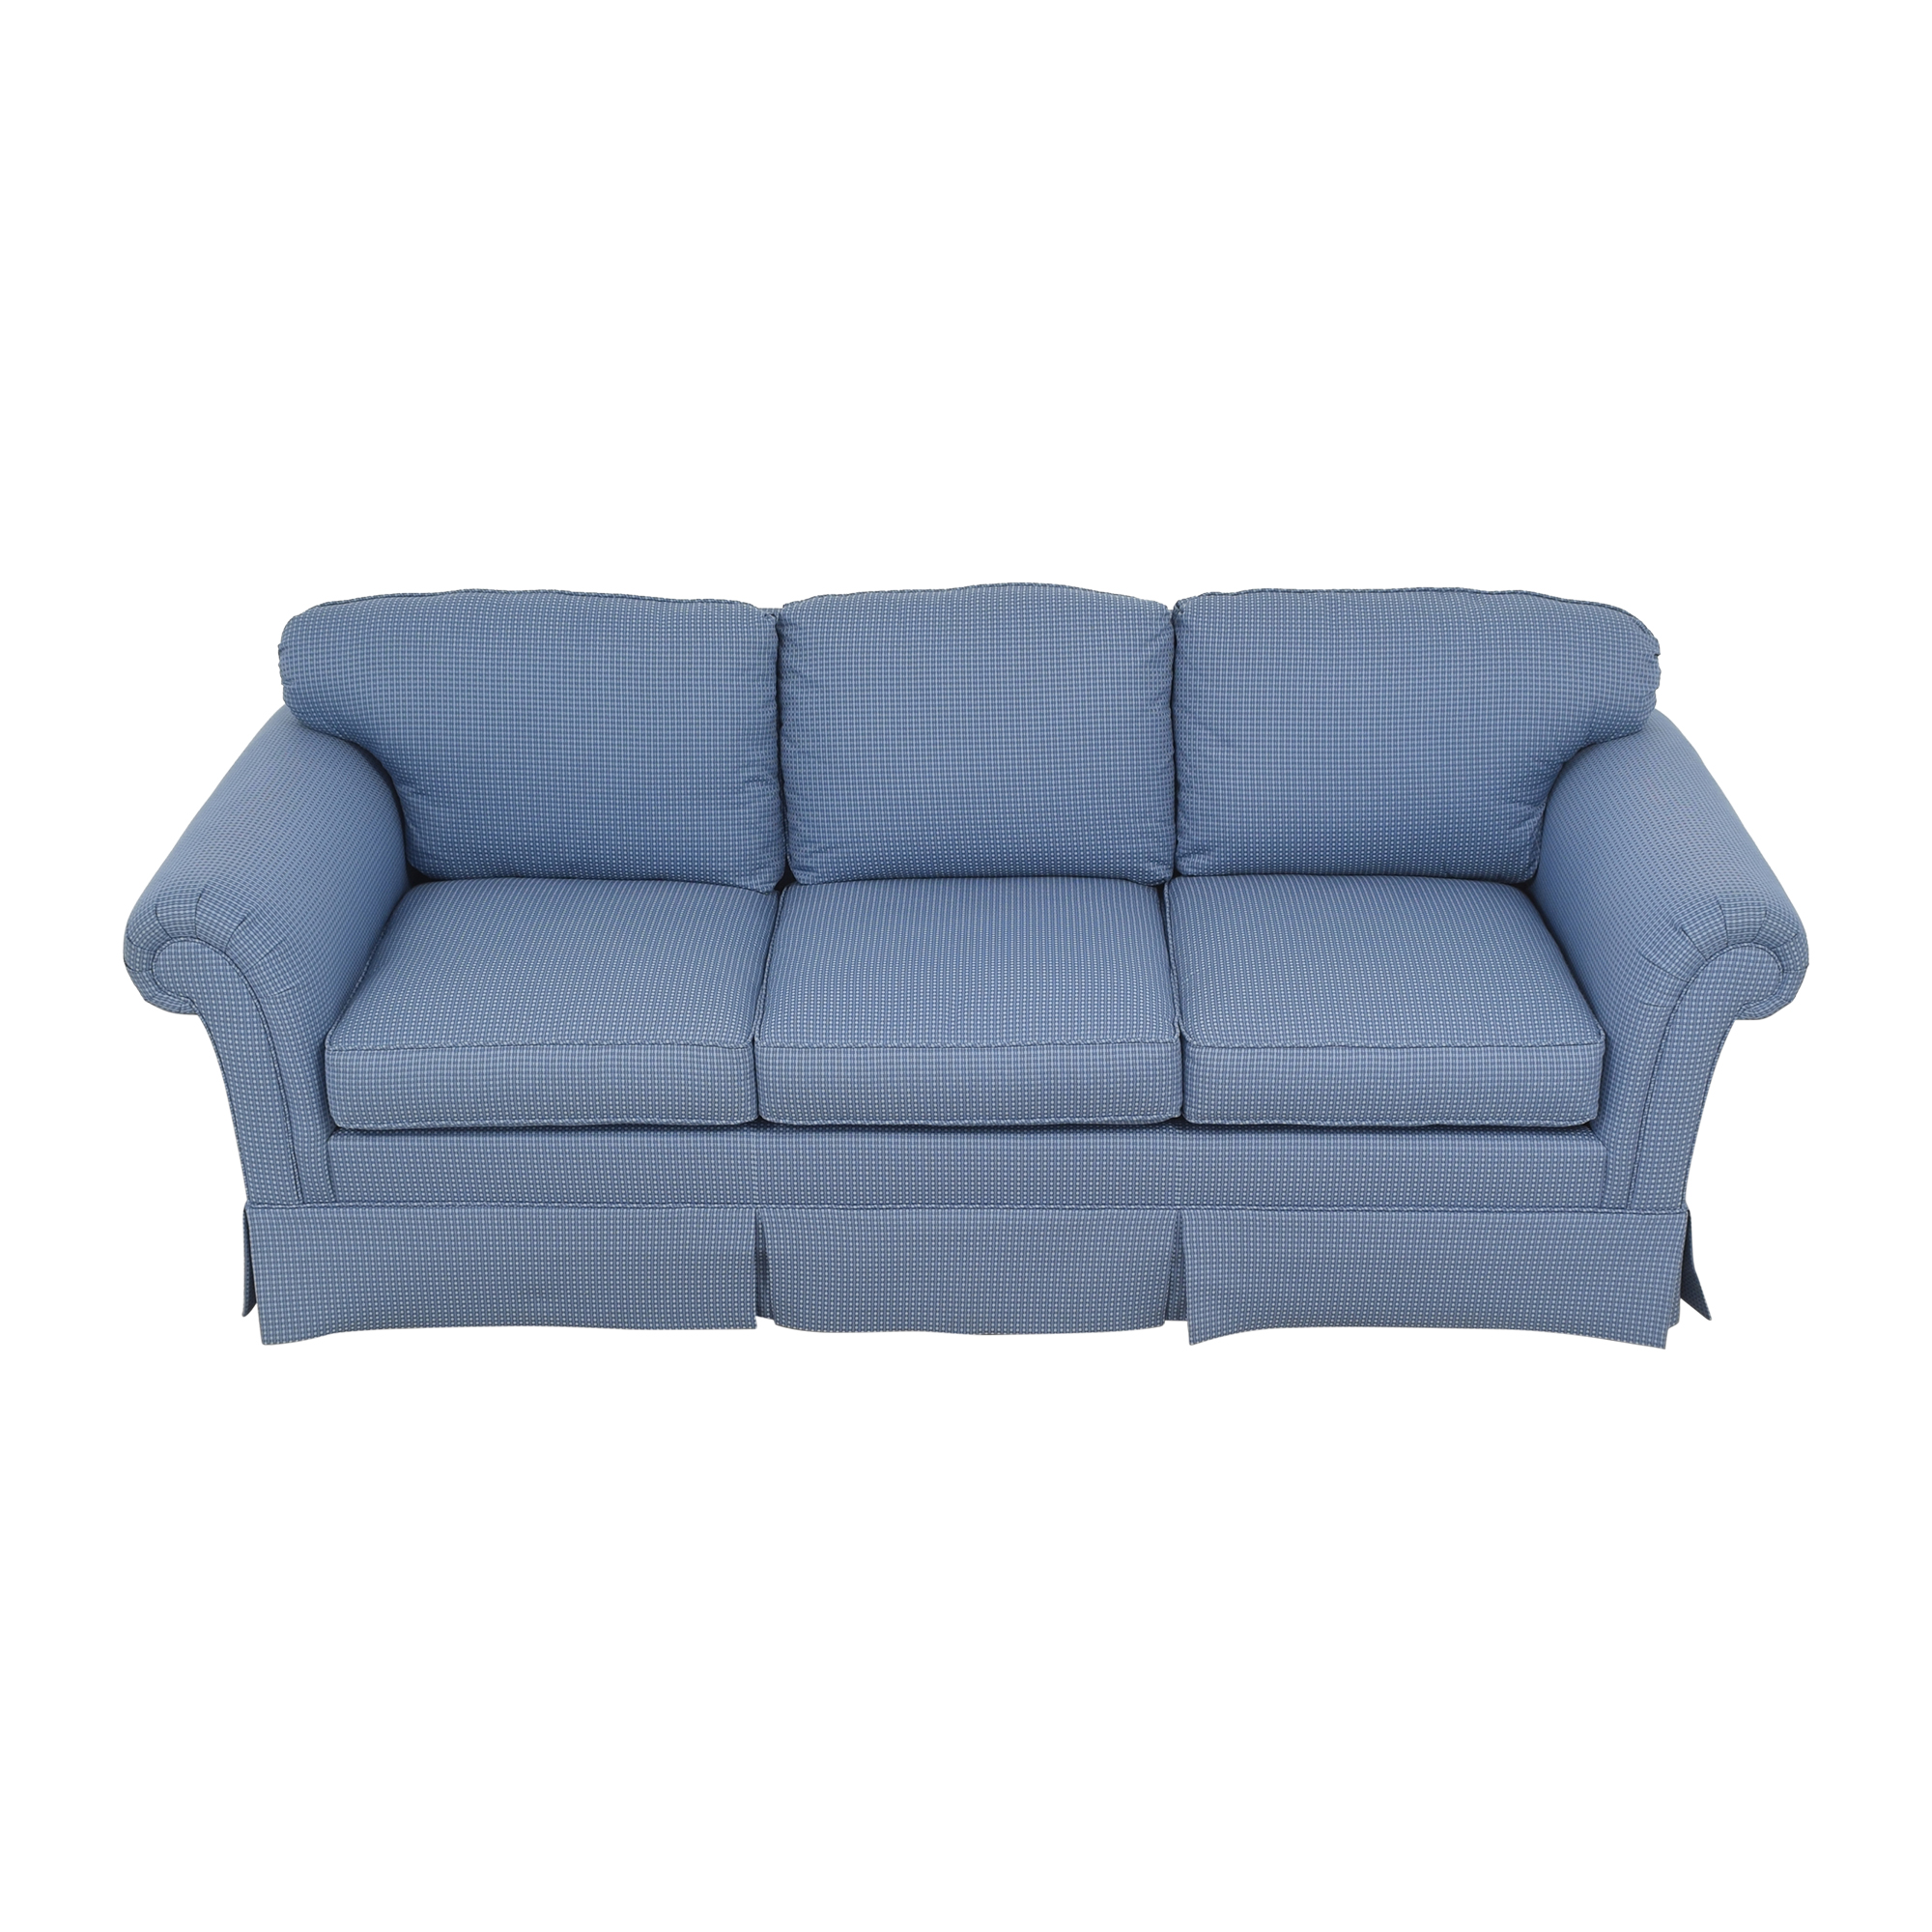 Kindel Sleigh Arm Sofa Kindel